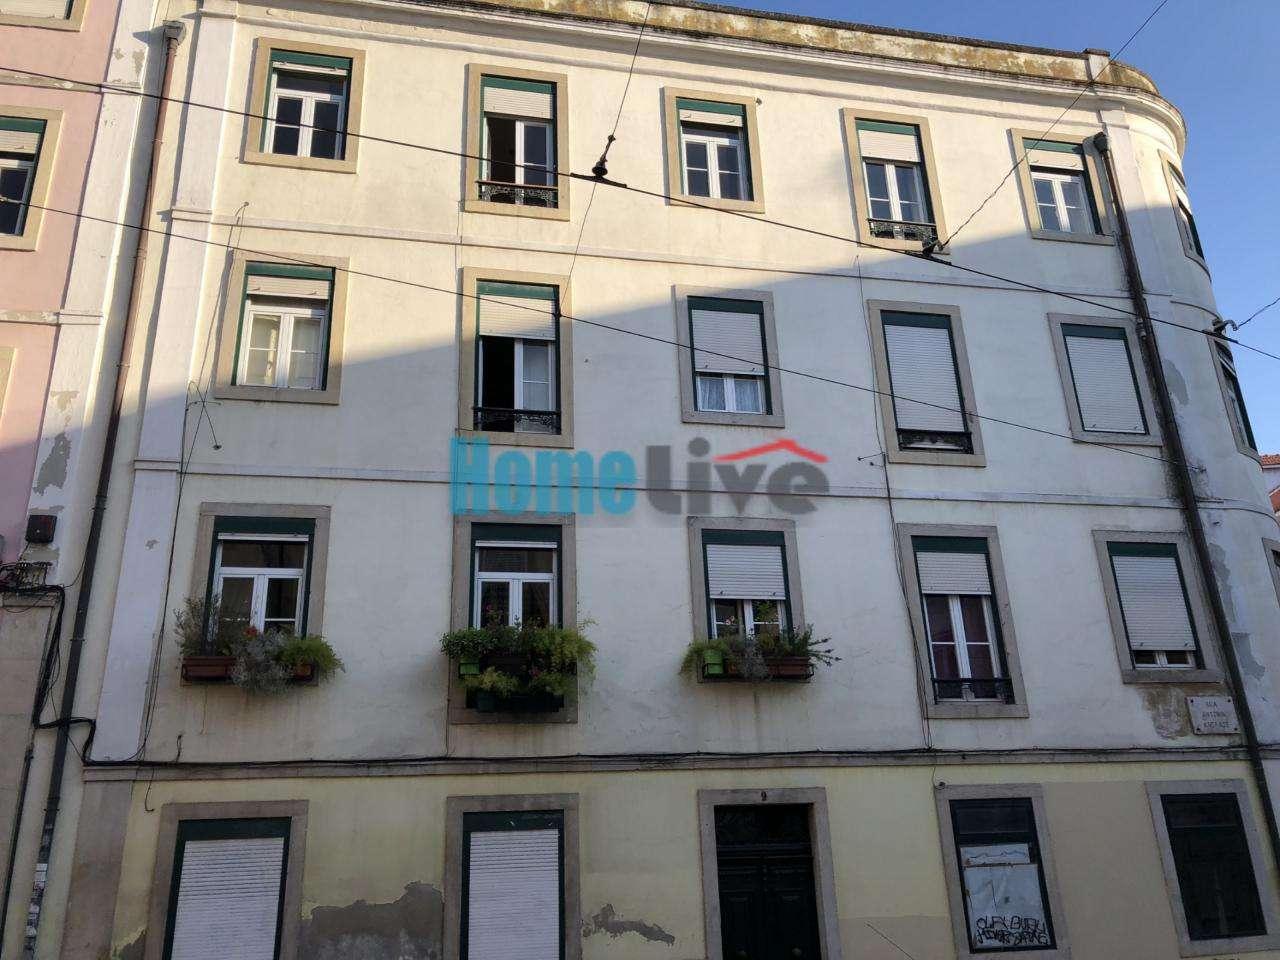 Apartamento para comprar, Arroios, Lisboa - Foto 25